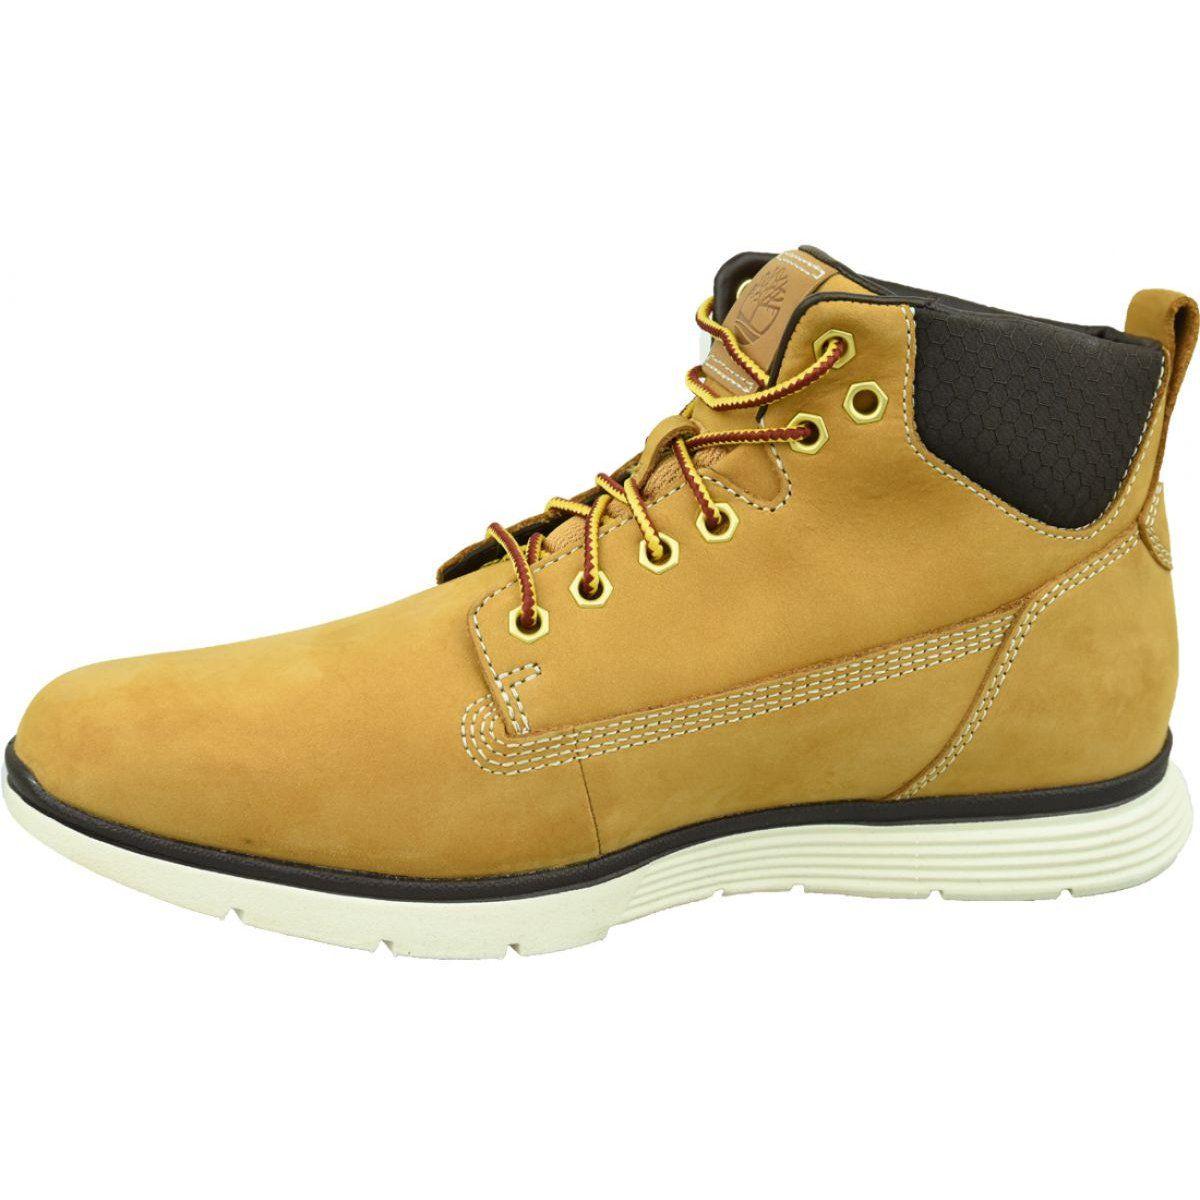 Buty Timberland Killington Chukka M A191i Zolte Killington Chukka Sport Shoes Men Popular Shoes